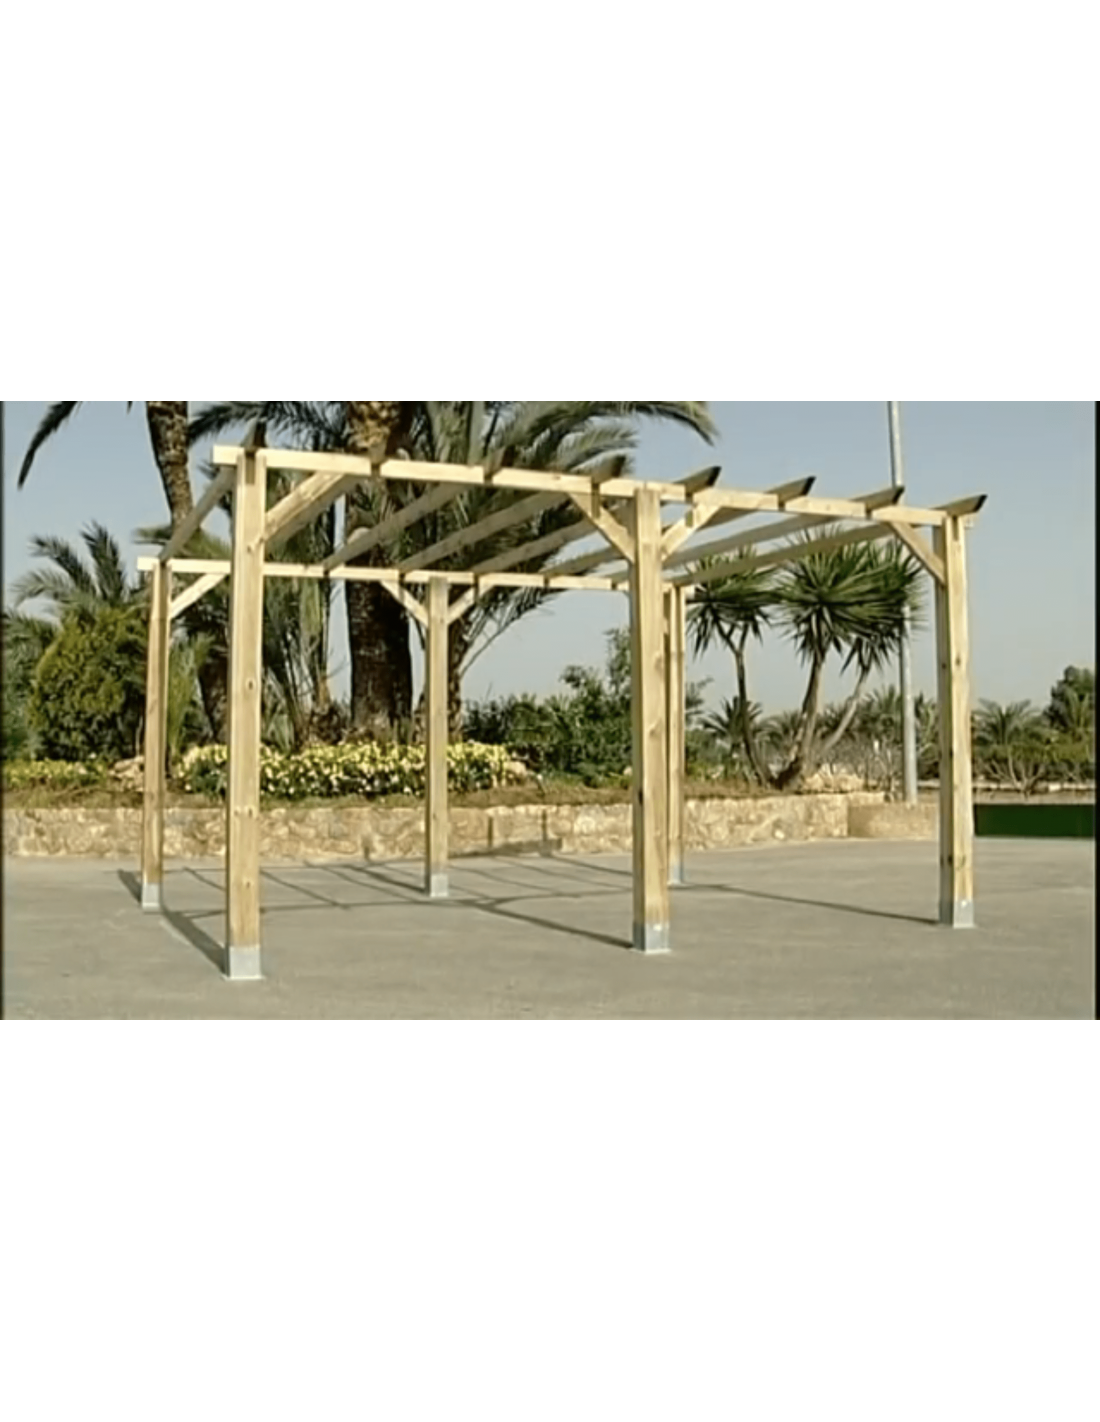 P rgola de madera 14 4 m postes 12 cm - Accesorios para pergolas ...